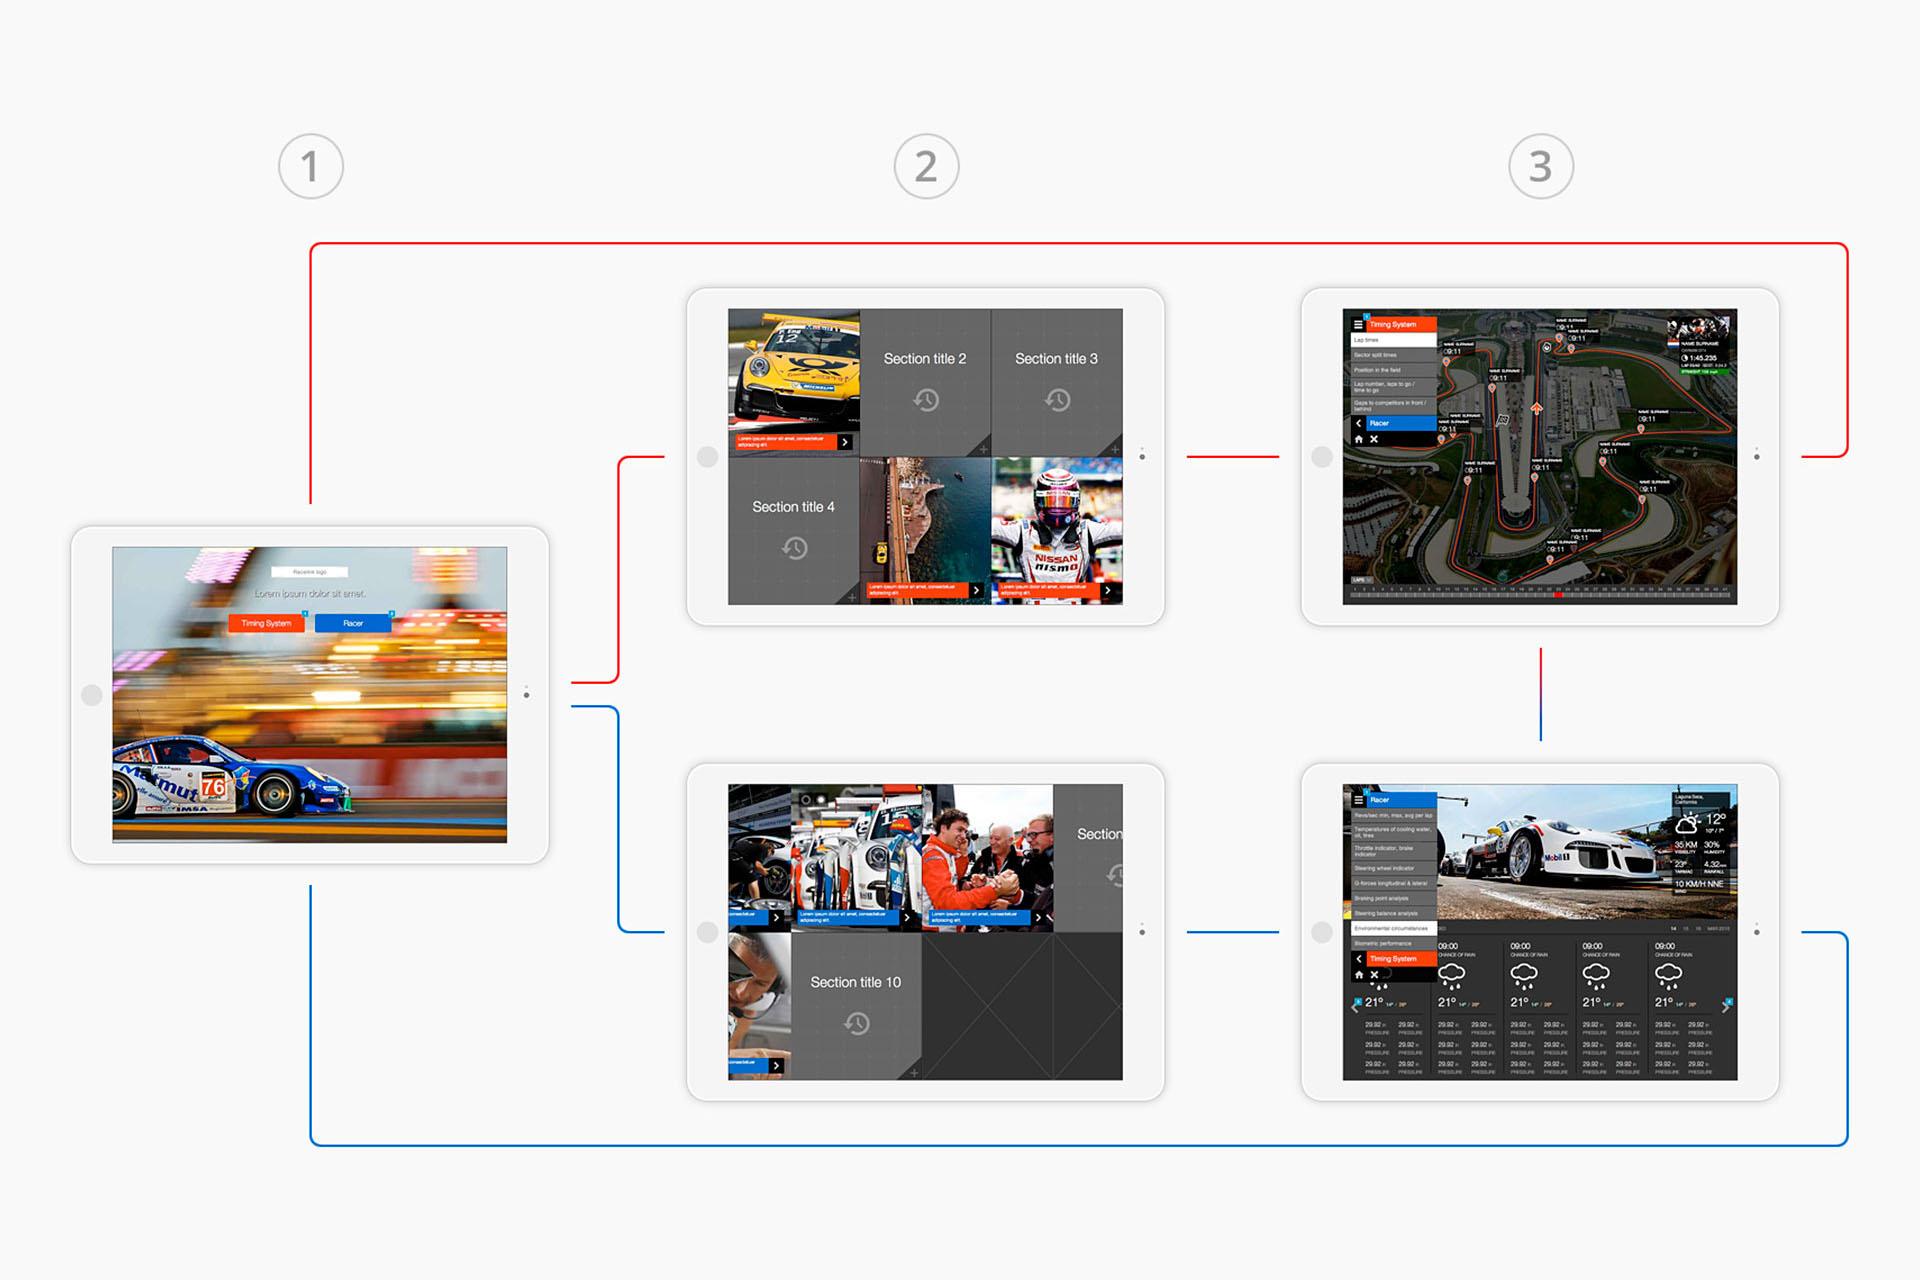 racelink - user journey